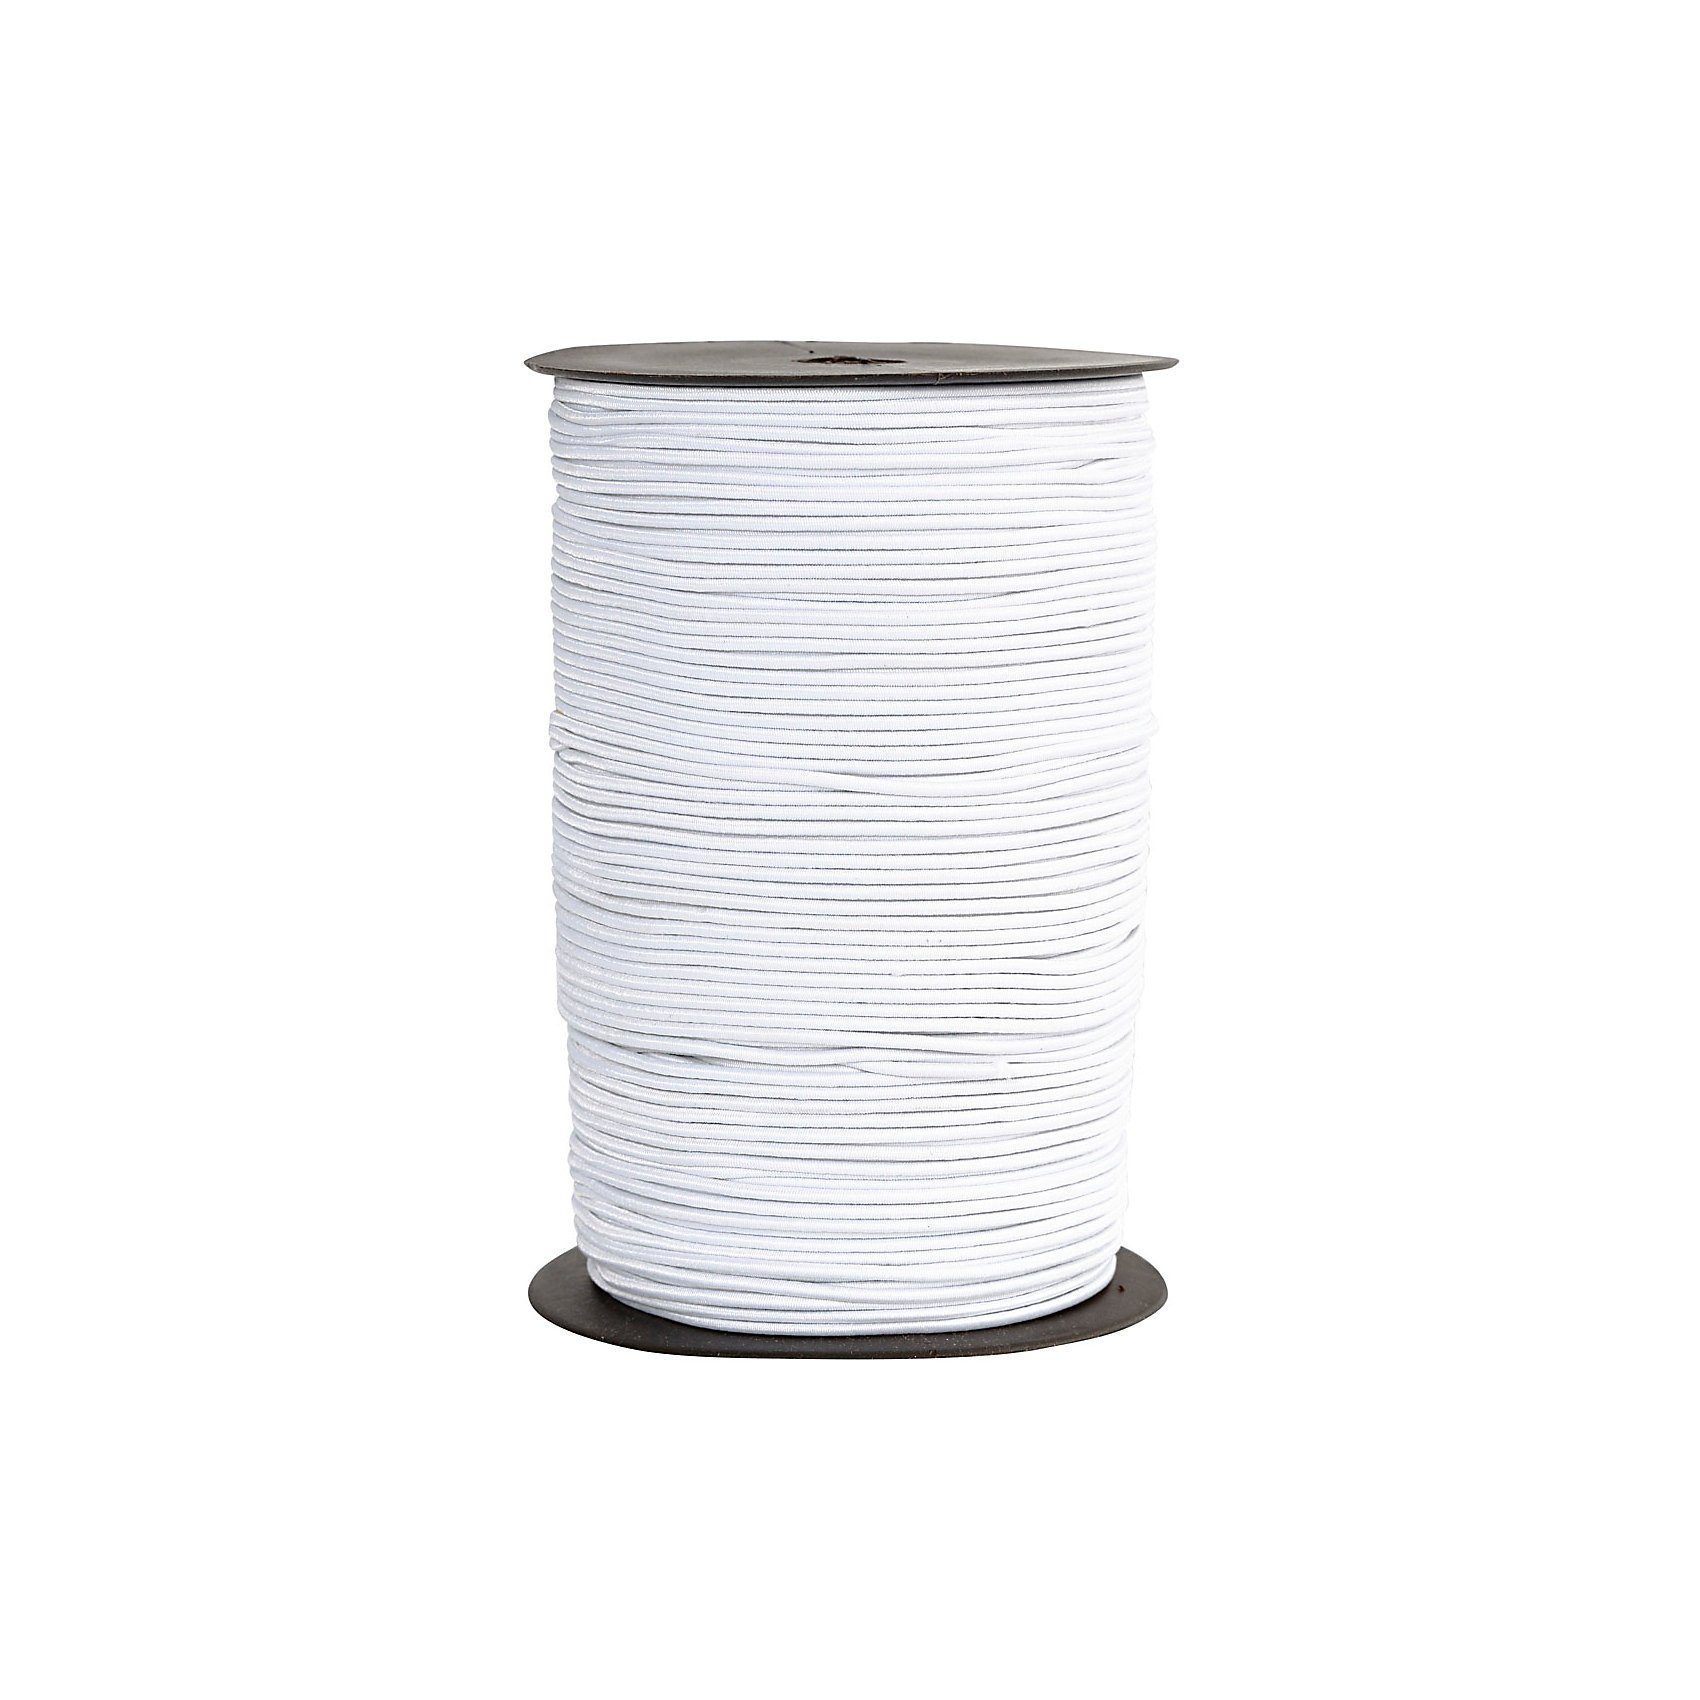 Elastikband, Stärke: 2 mm, 250 m, Weiß